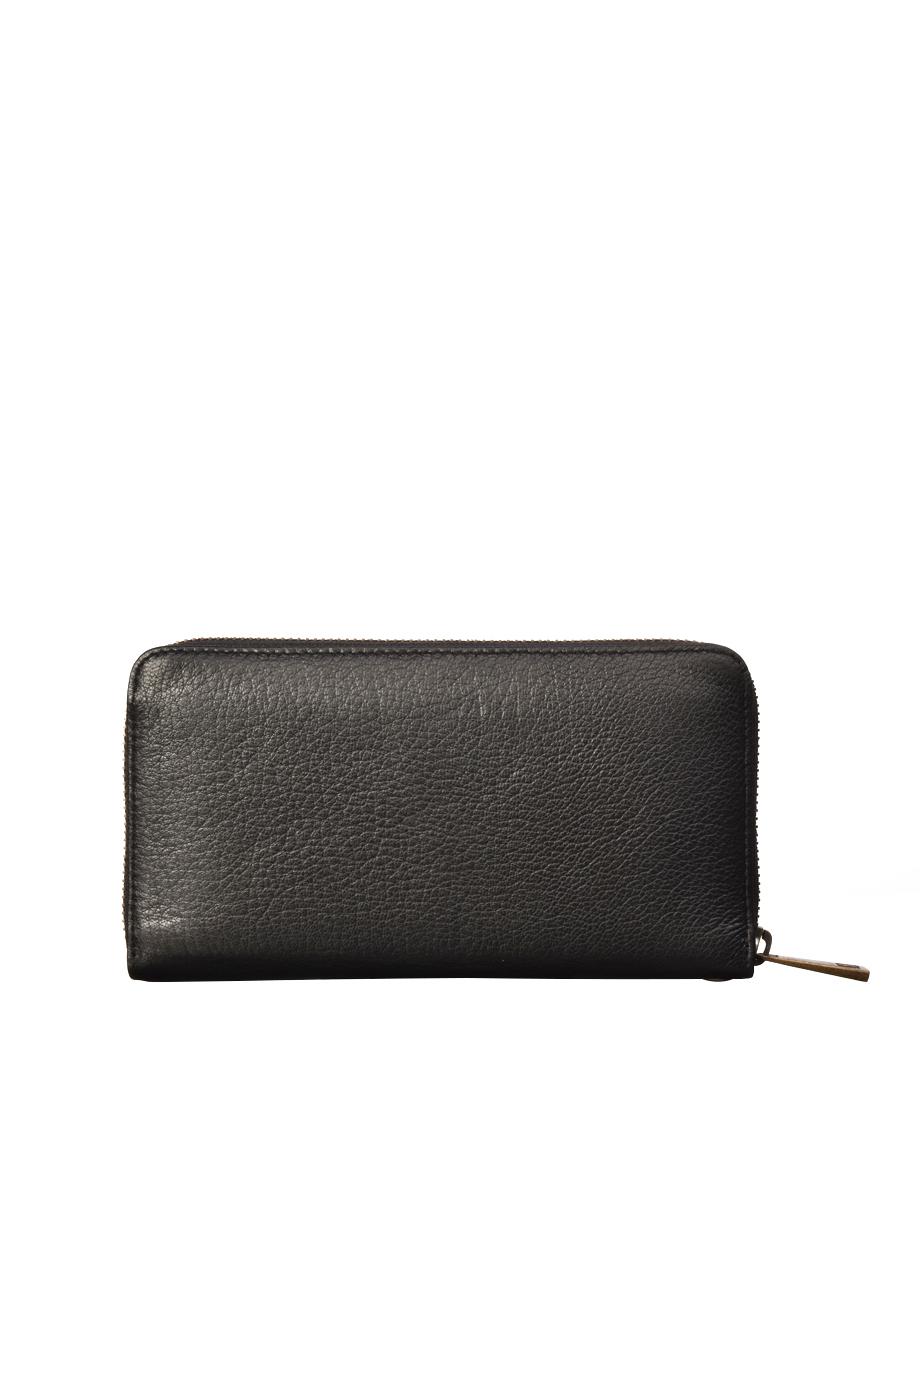 Handmade Soft Lambskin Wallets -